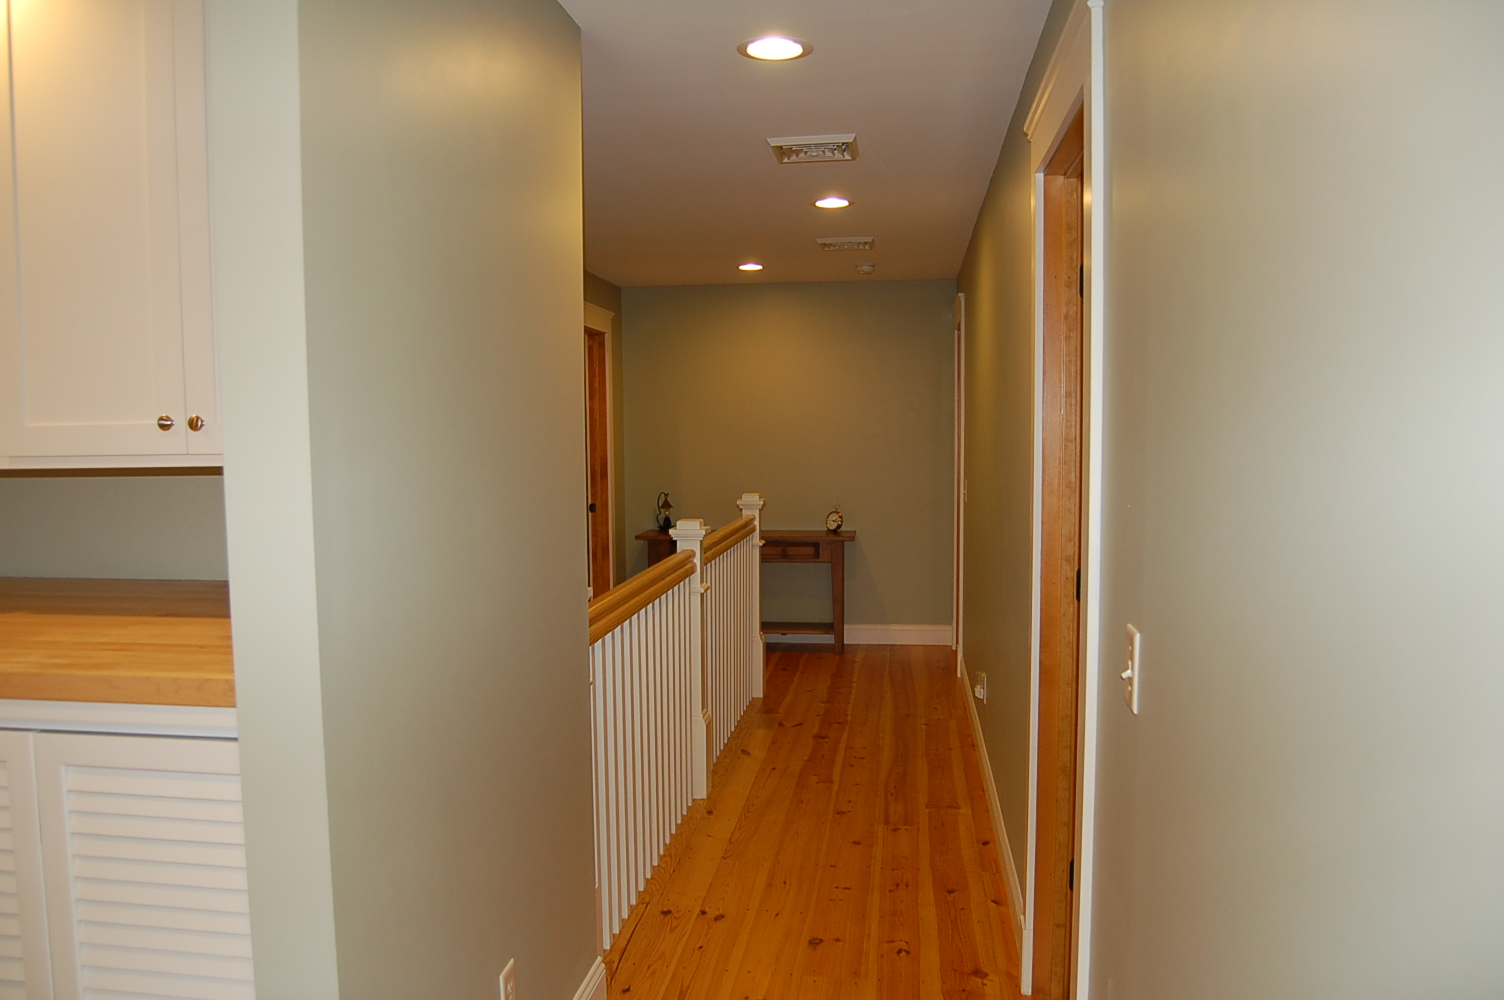 Upstairs hall with pine floors